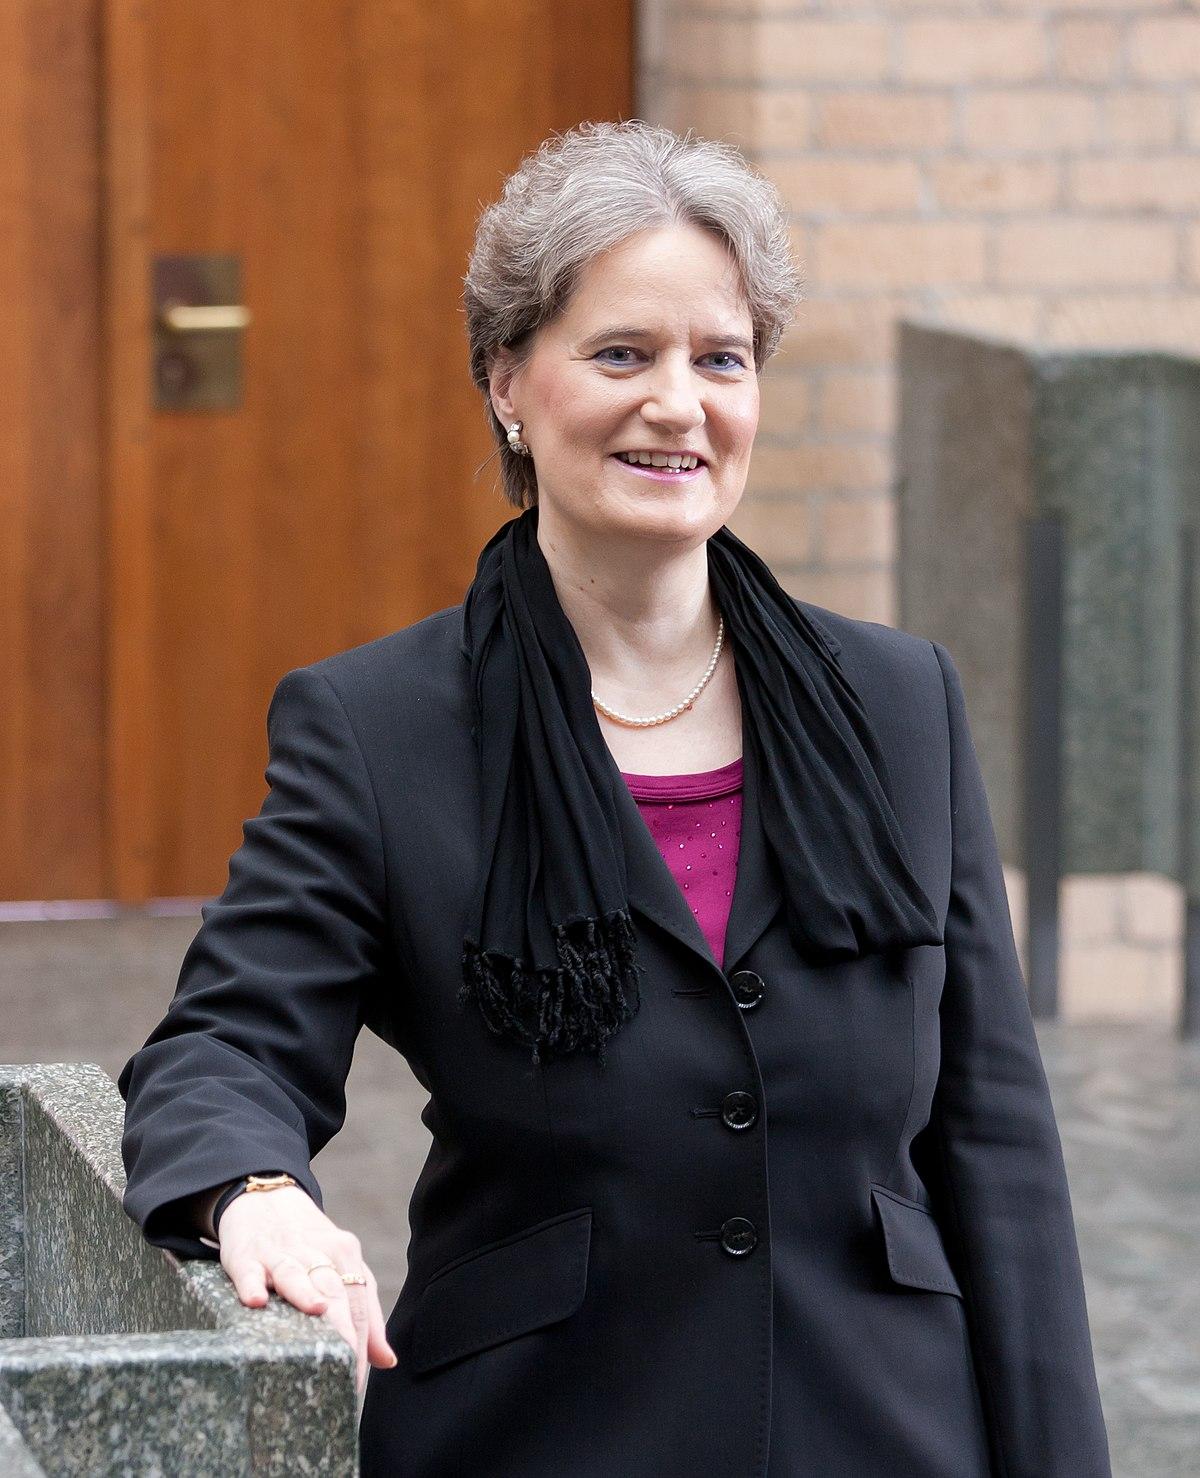 Susanne Laugwitz-Aulbach